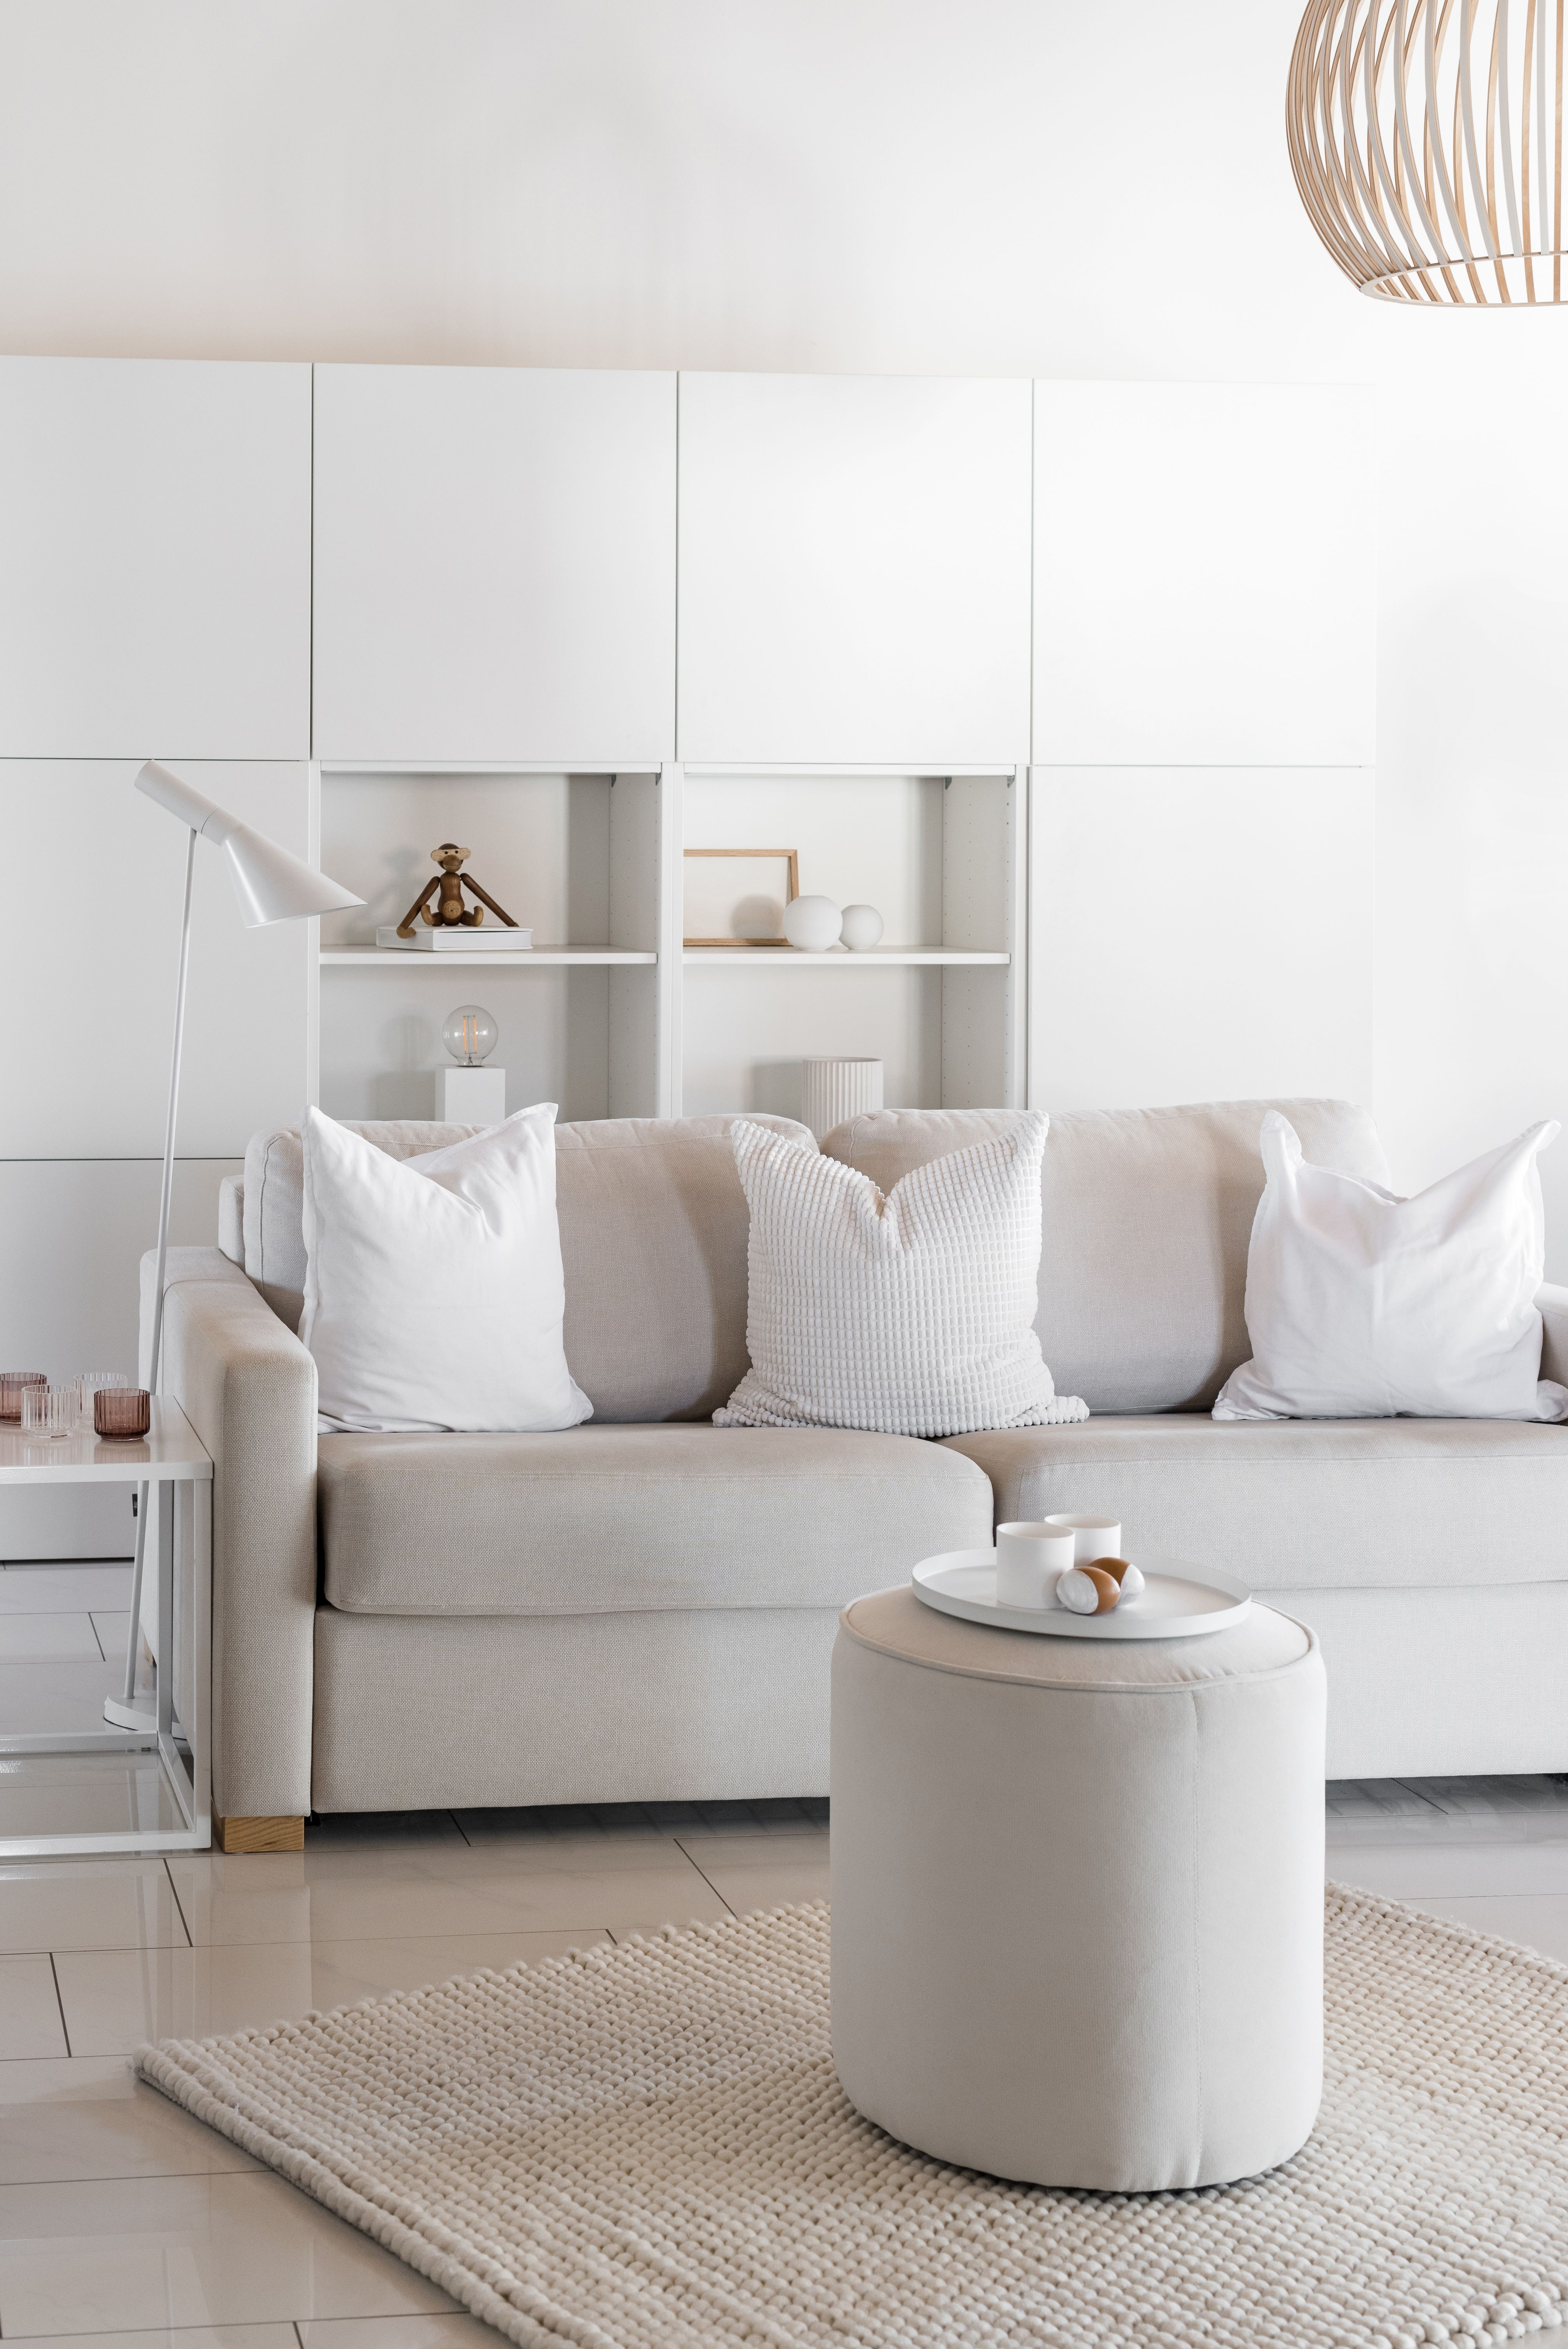 WOHNZIMMER #livingroom #interior #interiordesign #homedecor #whitehome #whiteinterior #minimalsm #home #scandinavian #inspohome #livingroomdecor #decoration #myhome #nordicliving